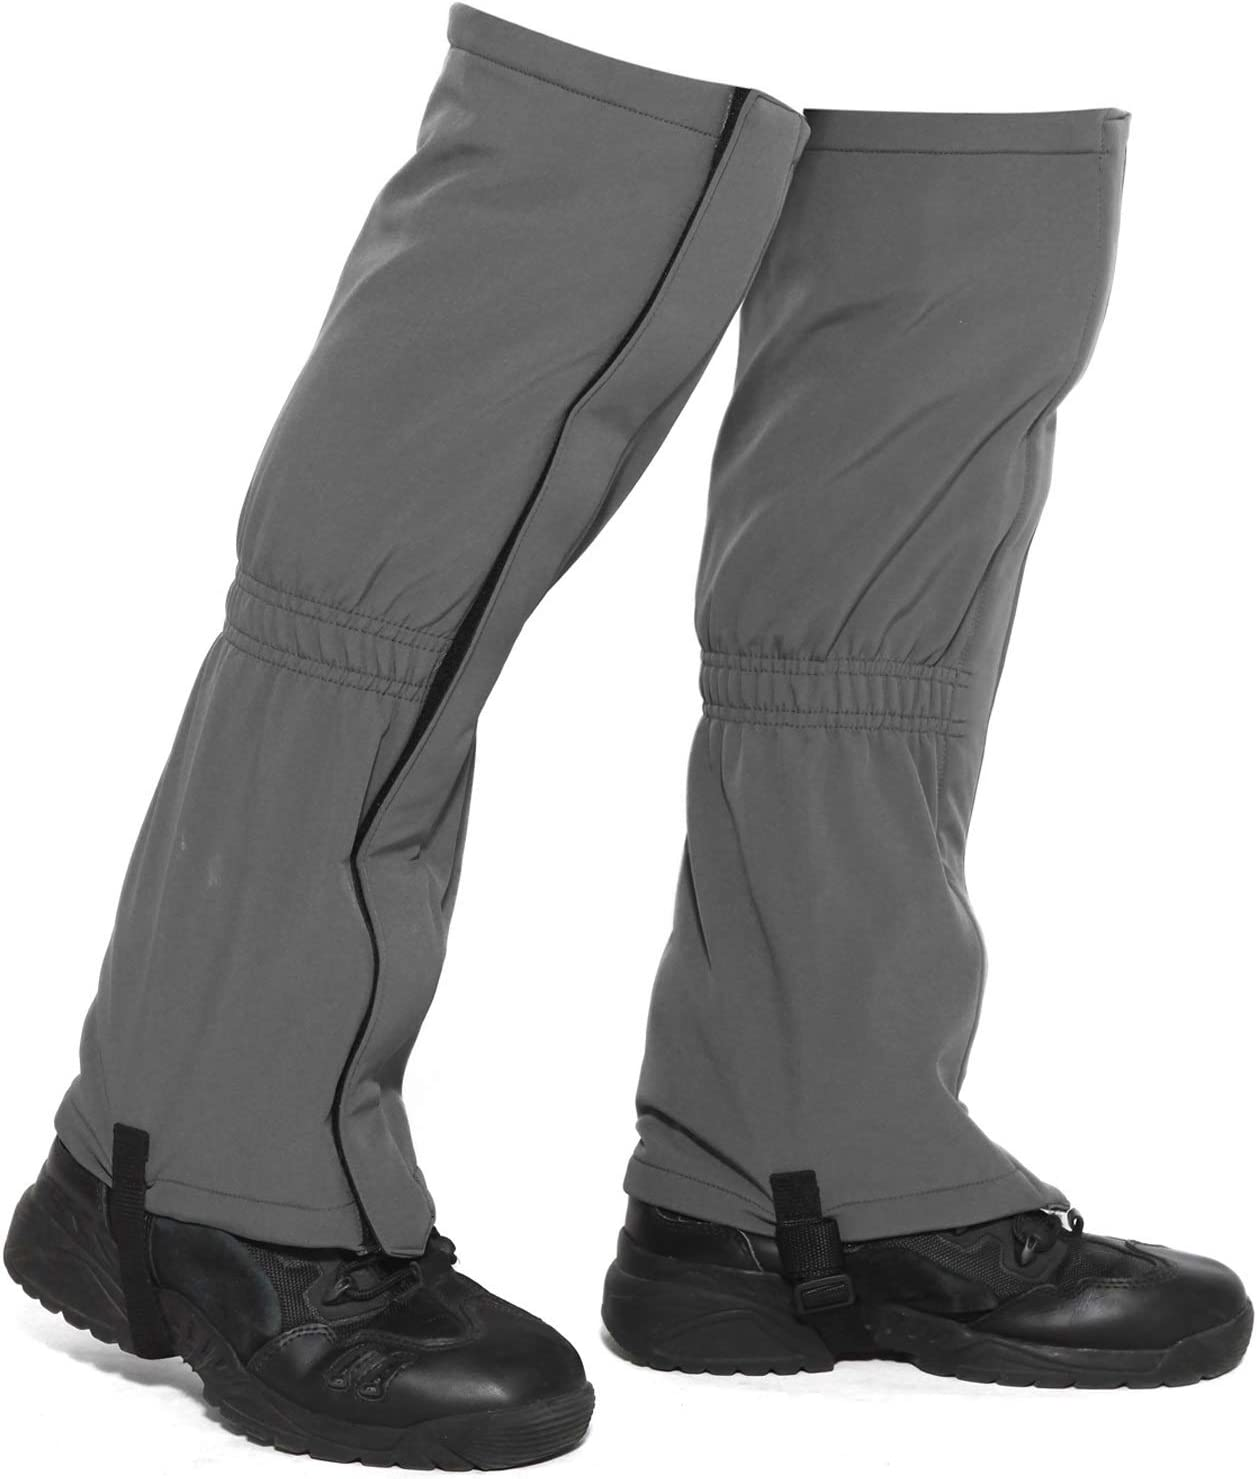 MERFUNTO Leg Gaiters for Hiking Waterproof Knee High Snow Gaiters for Winter